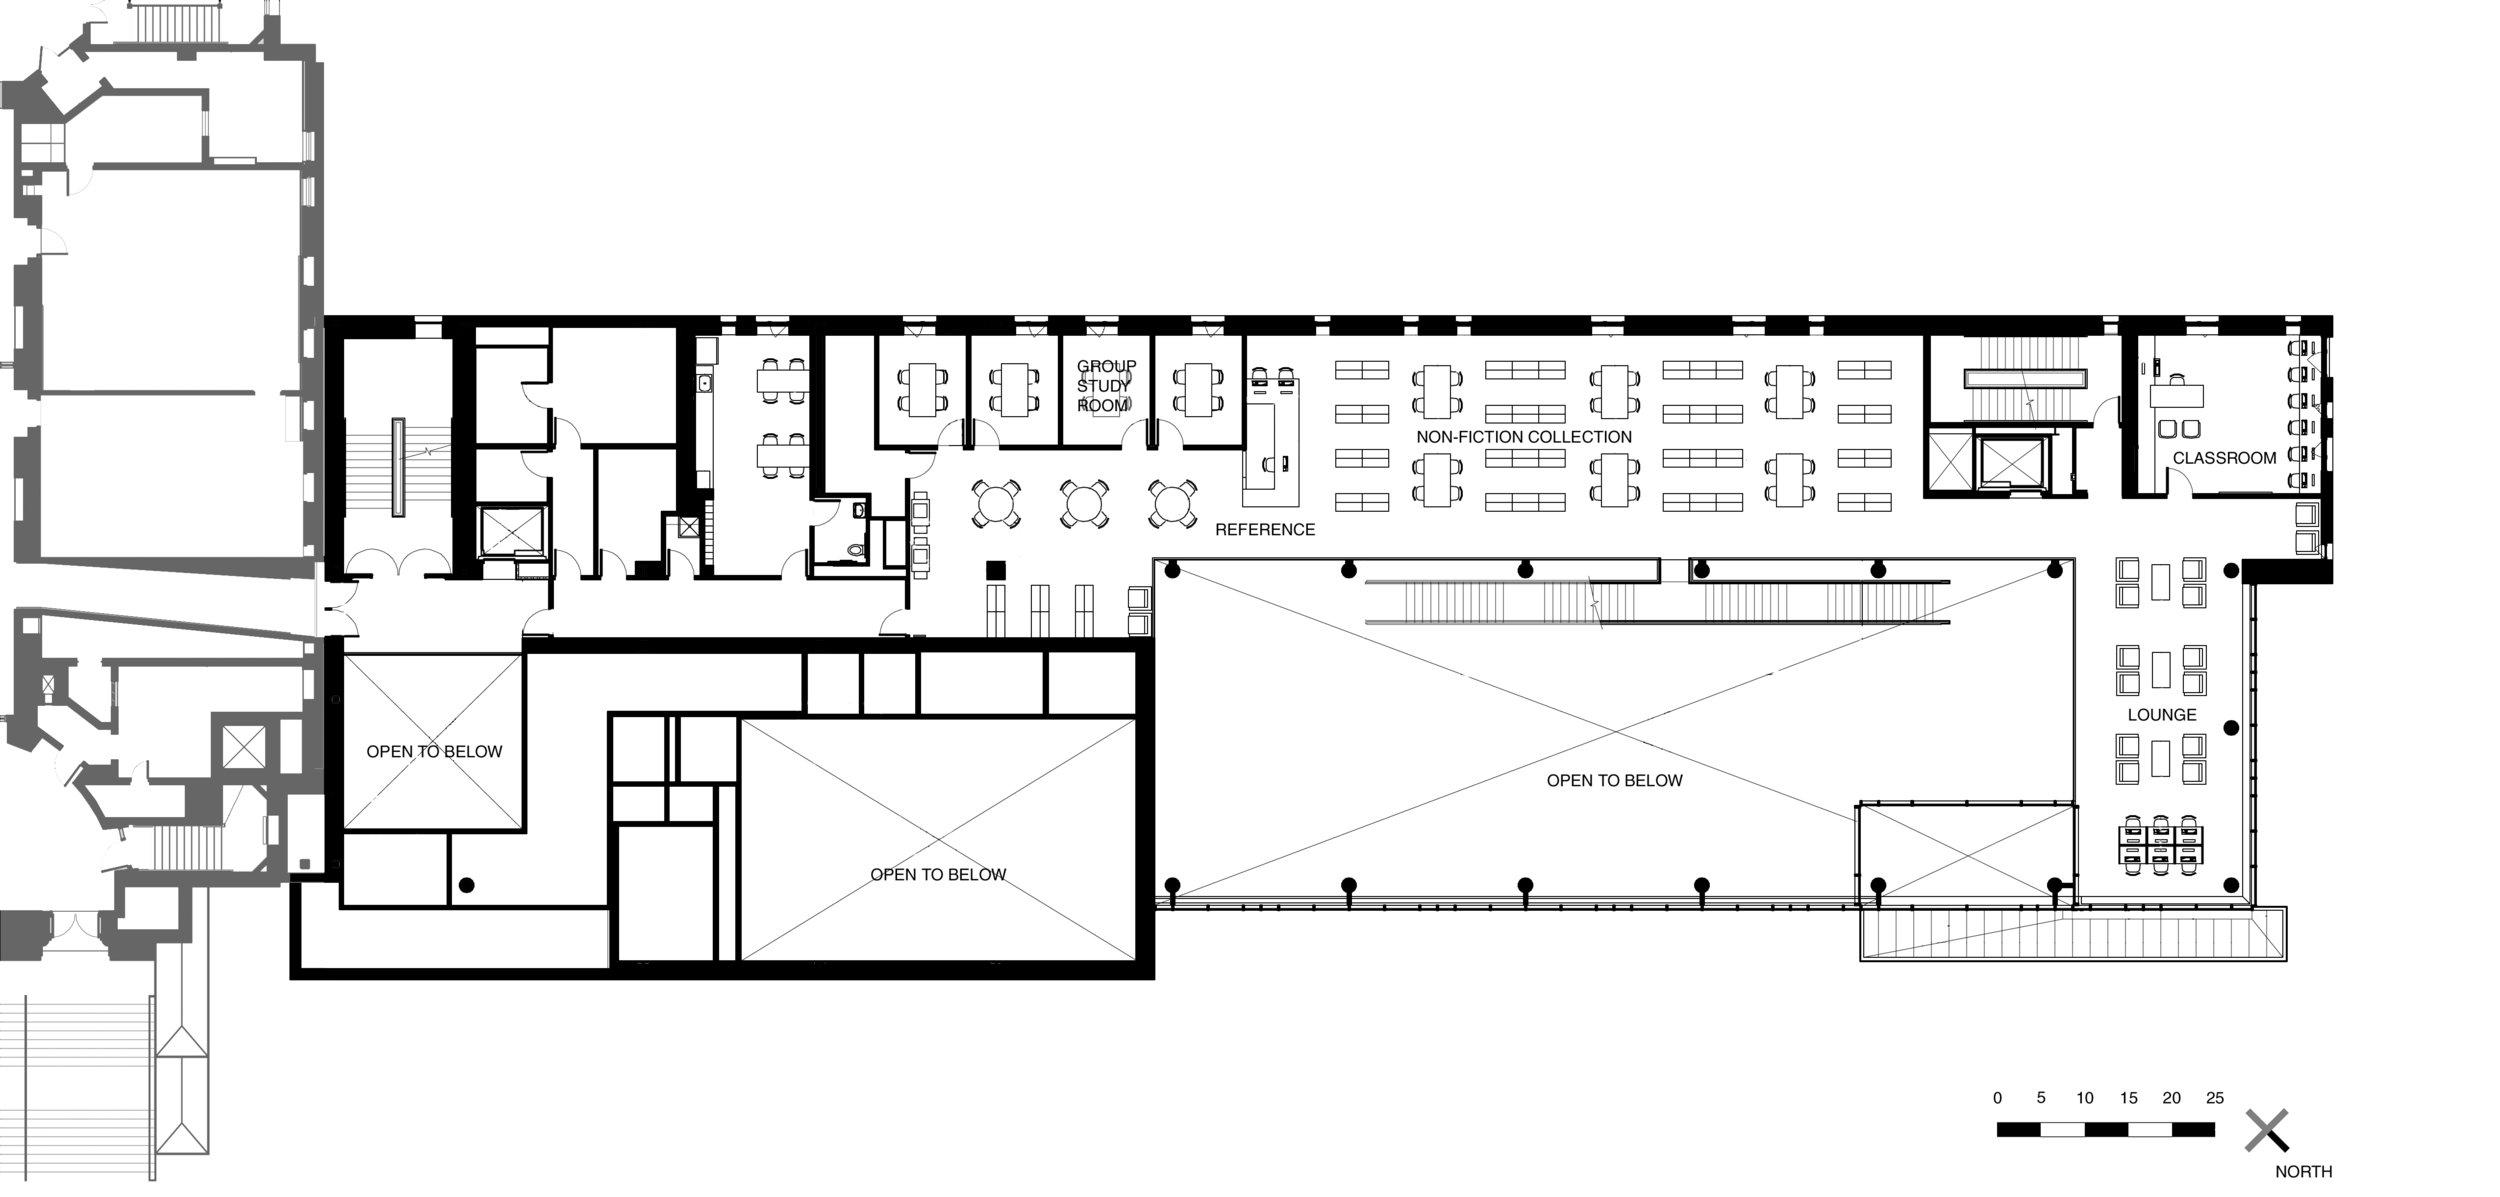 Mezzanine Floor Plan-Poche.jpg